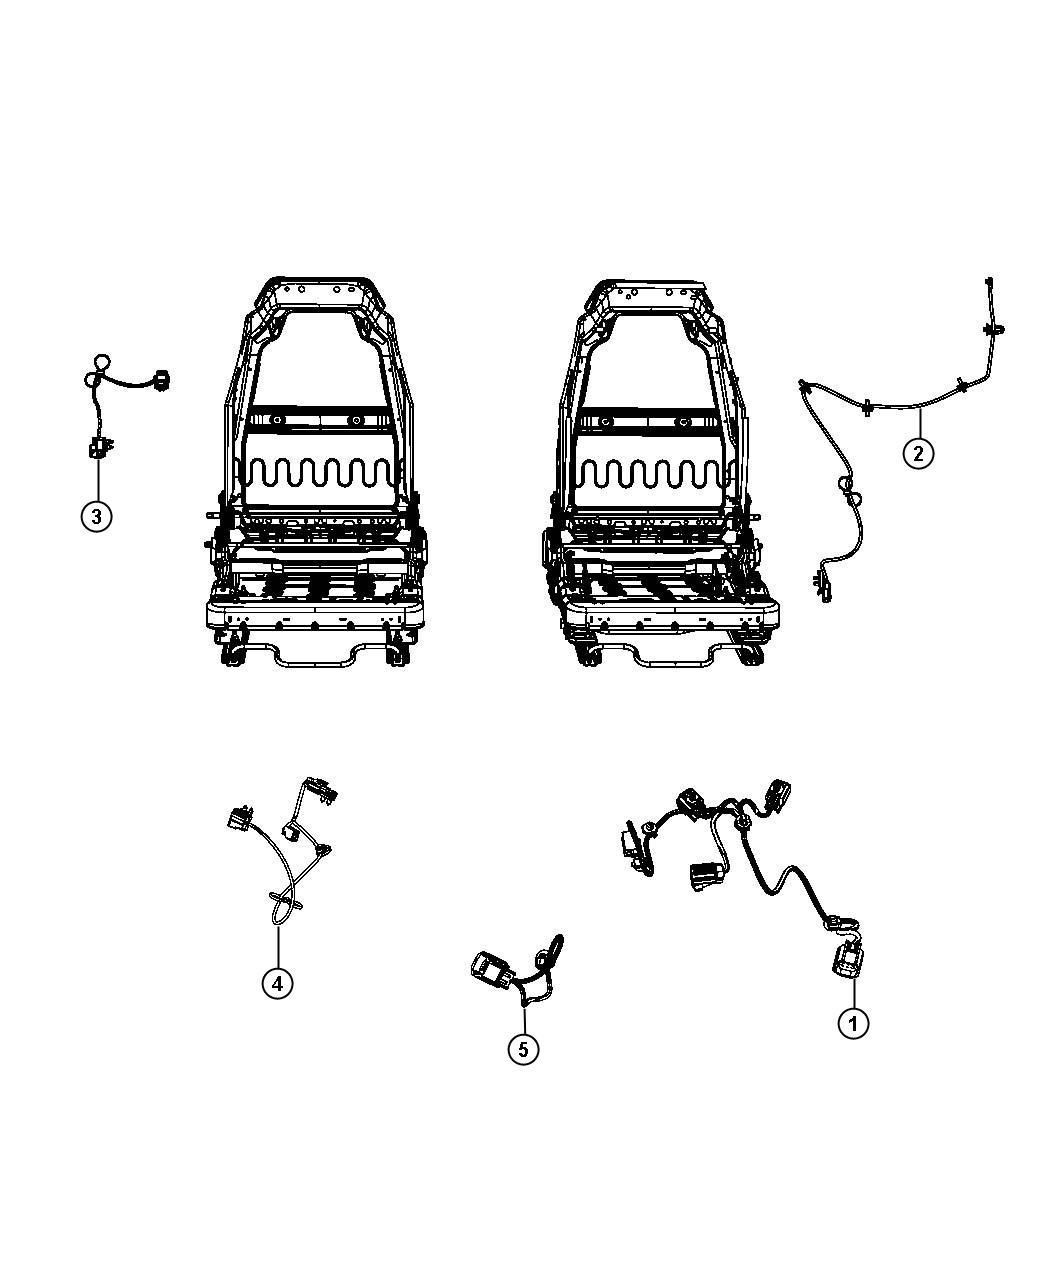 Air Ride Wiring Diagram - Diagrams Catalogue Harley Davidson Air Ride Wiring Diagram on